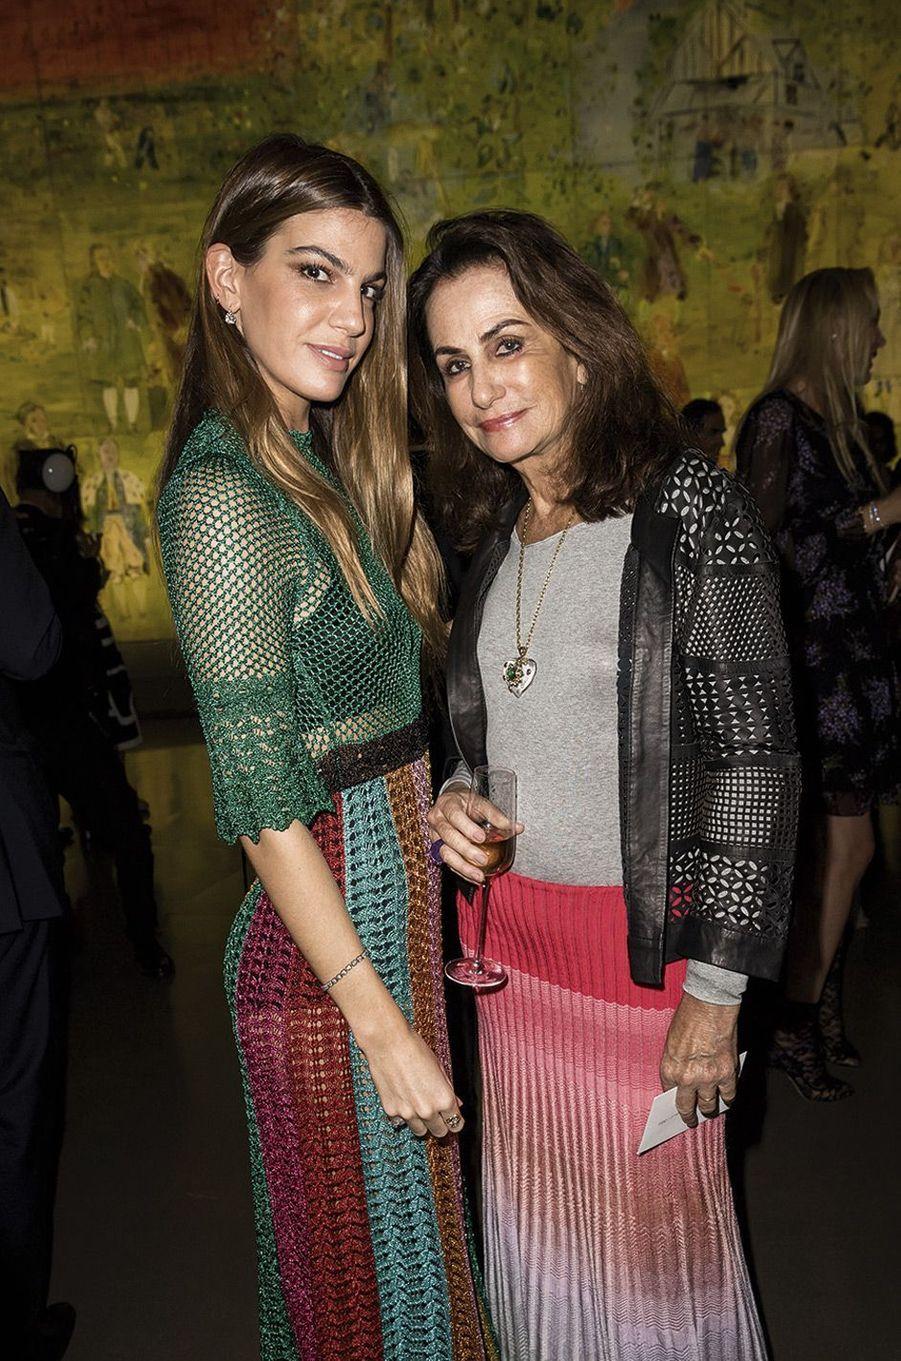 Bianca et Georgina Bradolini d'Adda.